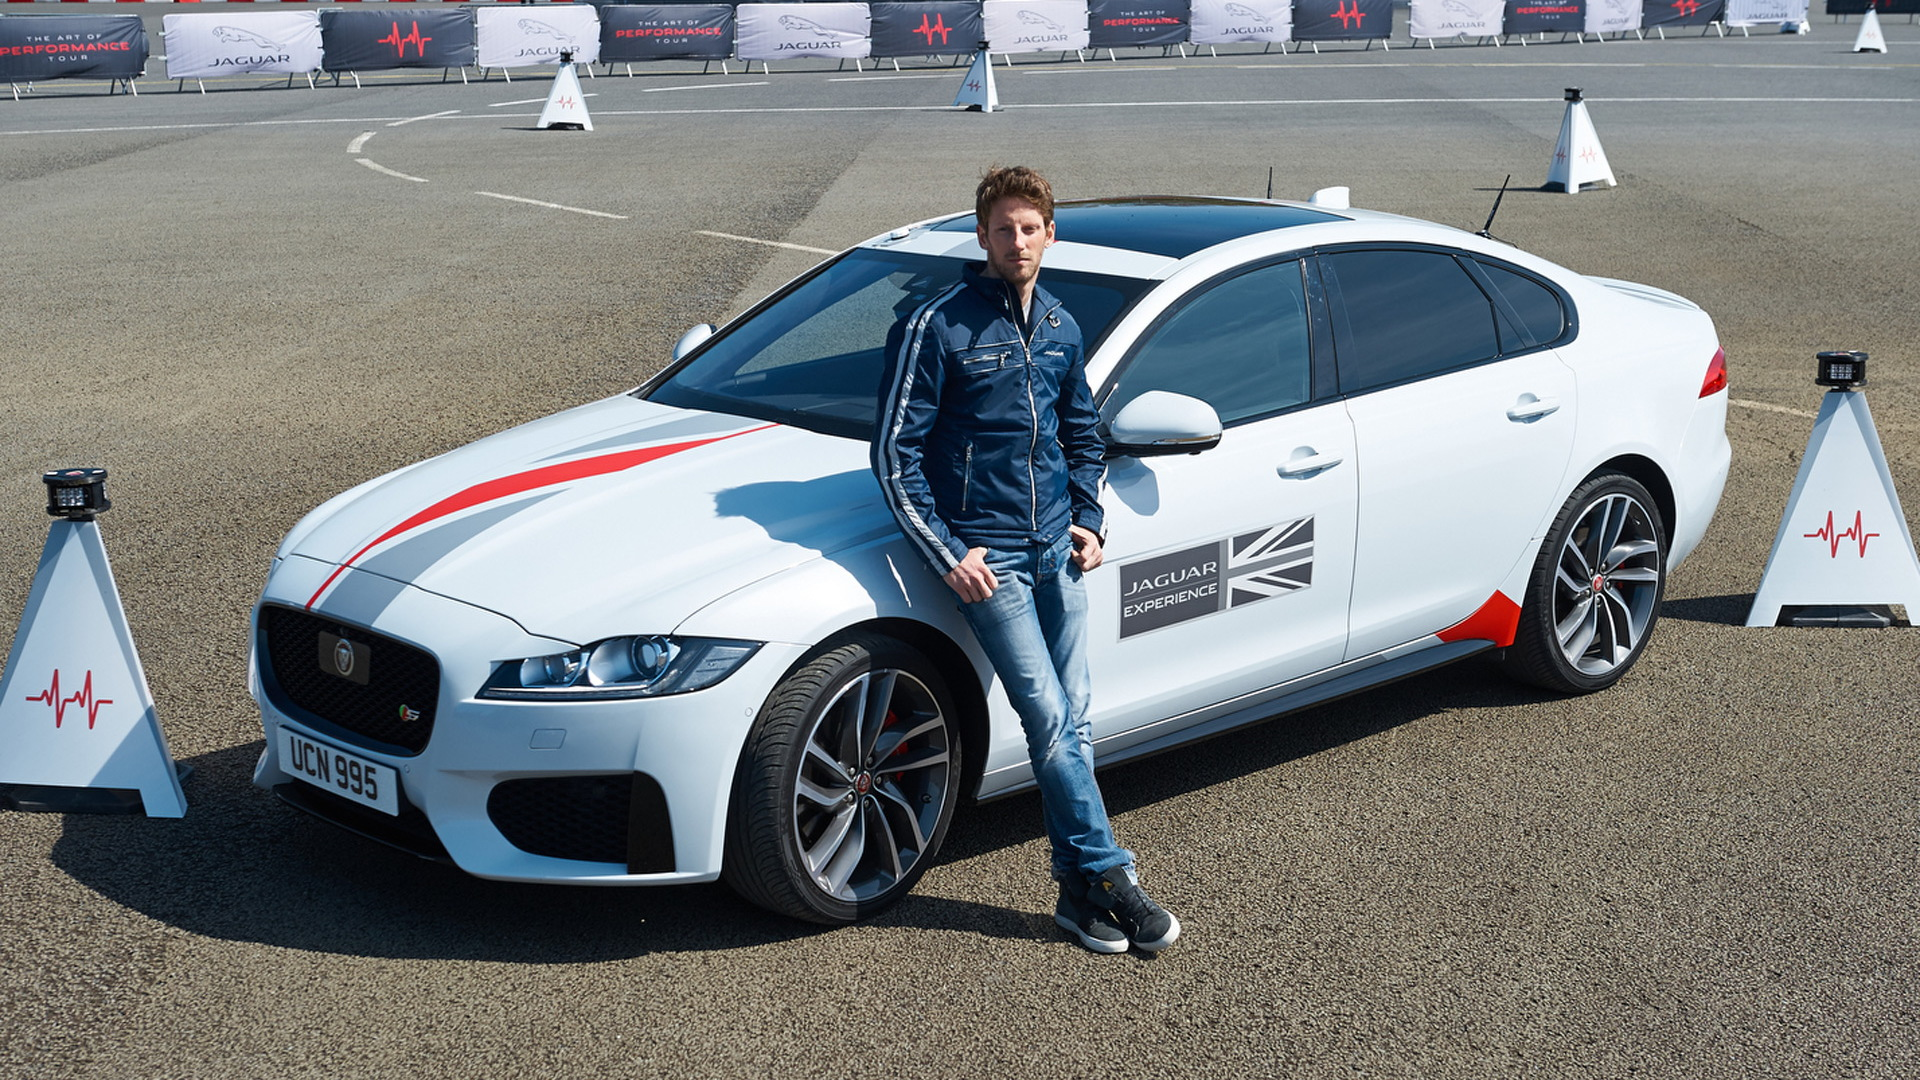 Haas Formula One driver Romain Grosjean and the 2016 Jaguar XF